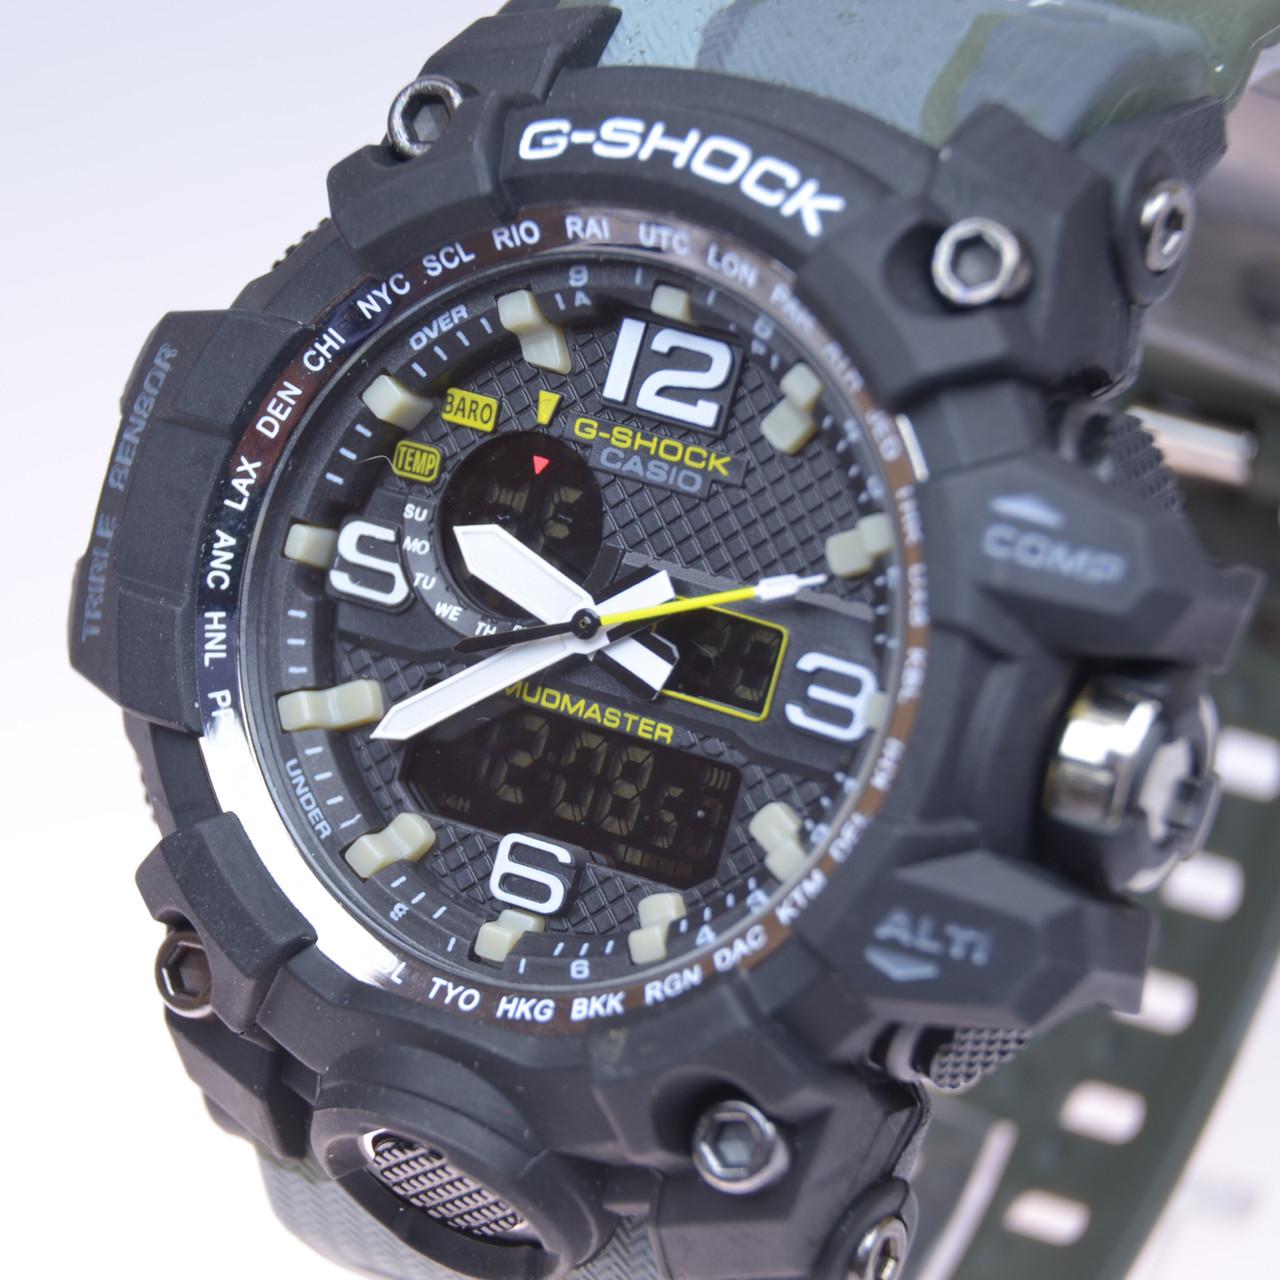 4ecae948 Мужские наручные часы Casio G-SHOCK CPW-1000 камуфляж (копия ...